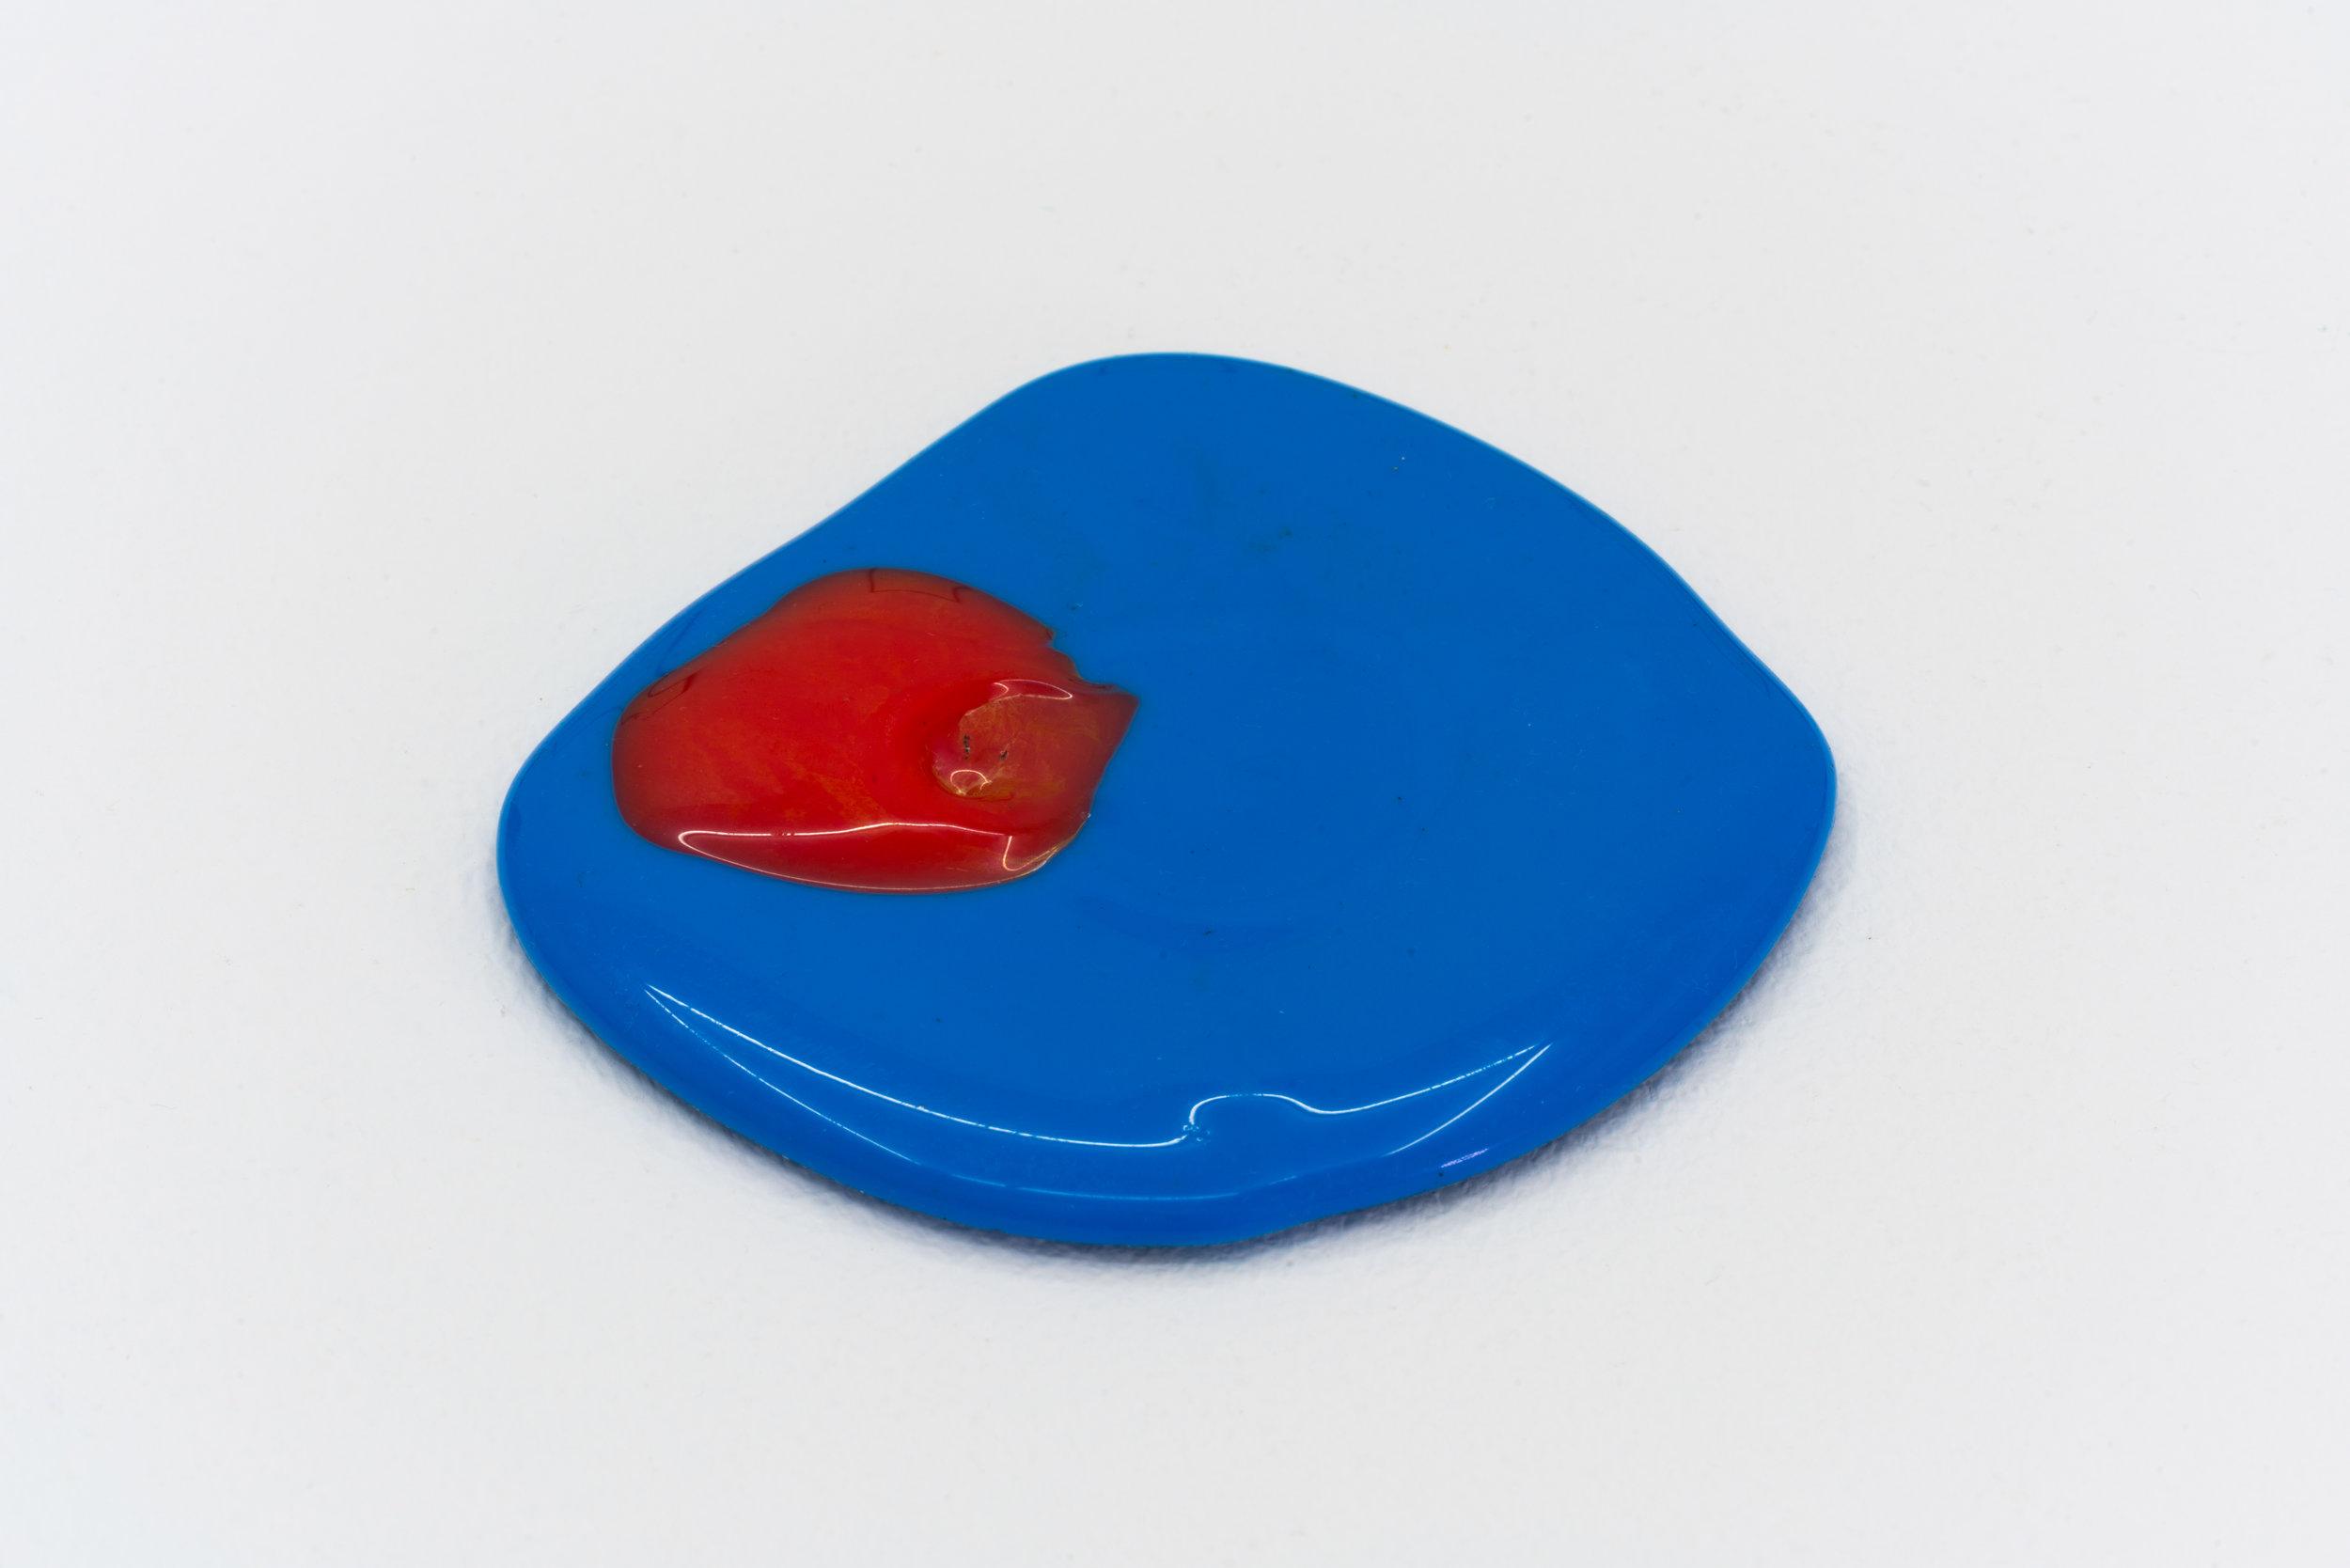 Remko Scha,  Plastic Meltdown , 1962-1992, Plastic, 0.5 x 9 x 8 cm